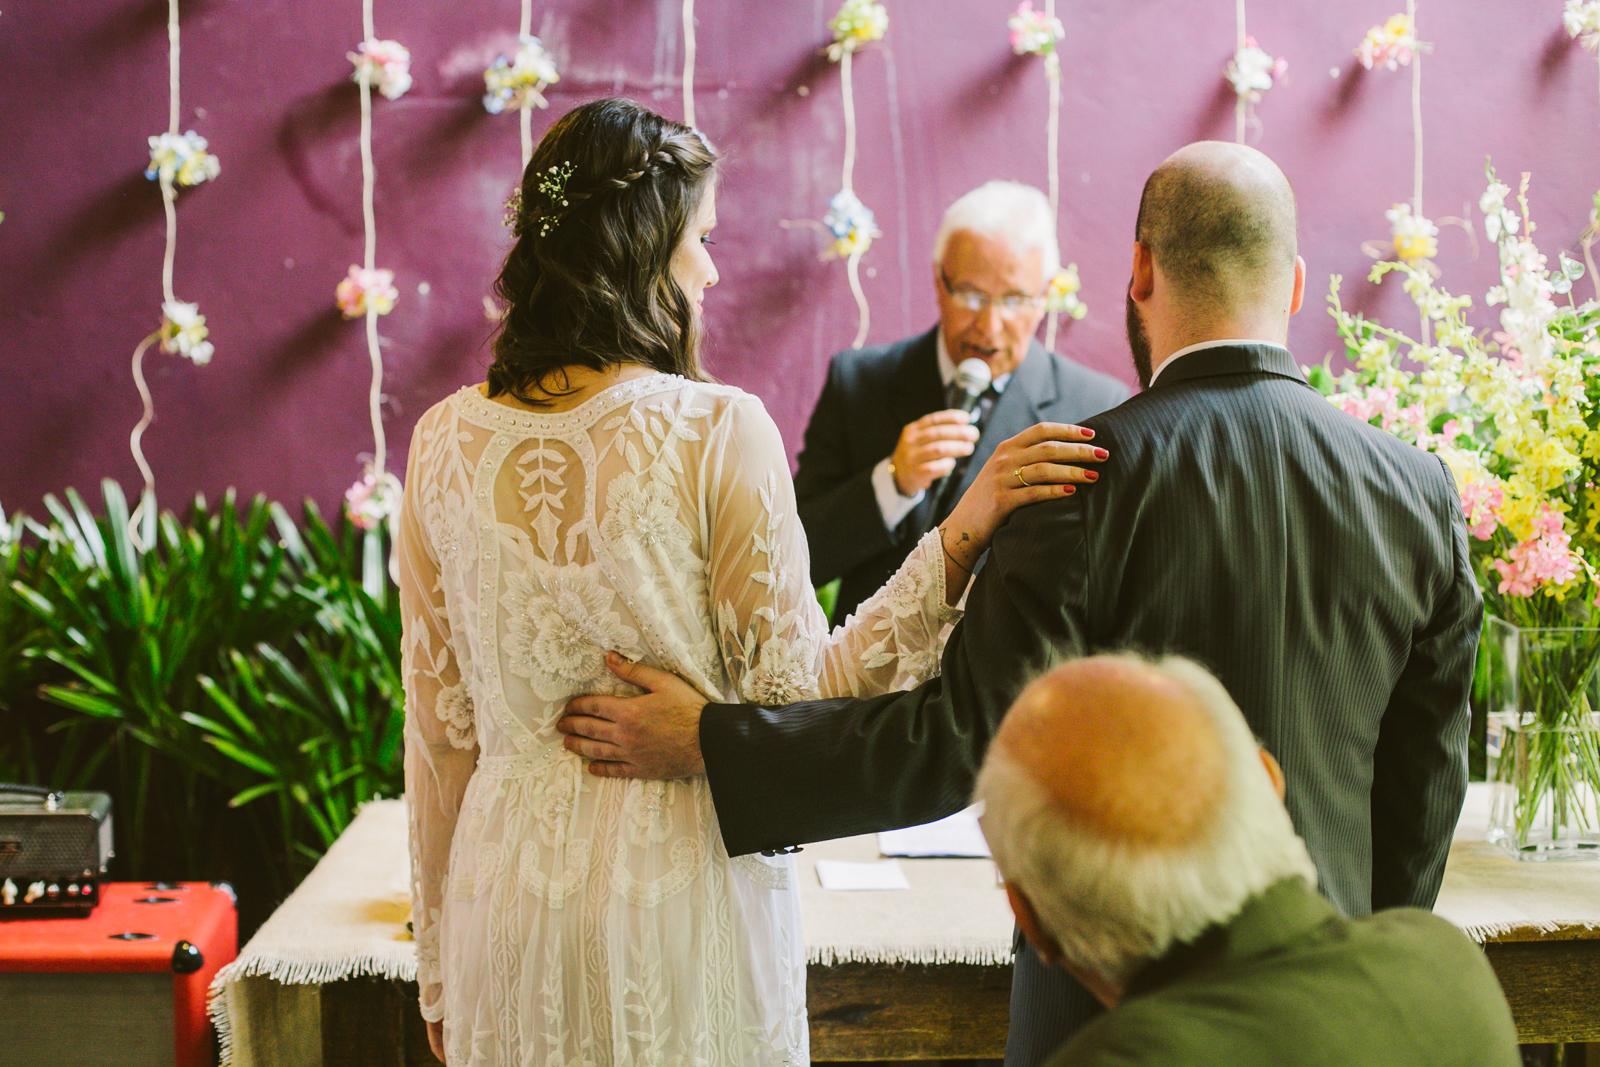 Casamento simples mostra que o amor é o que conta 6